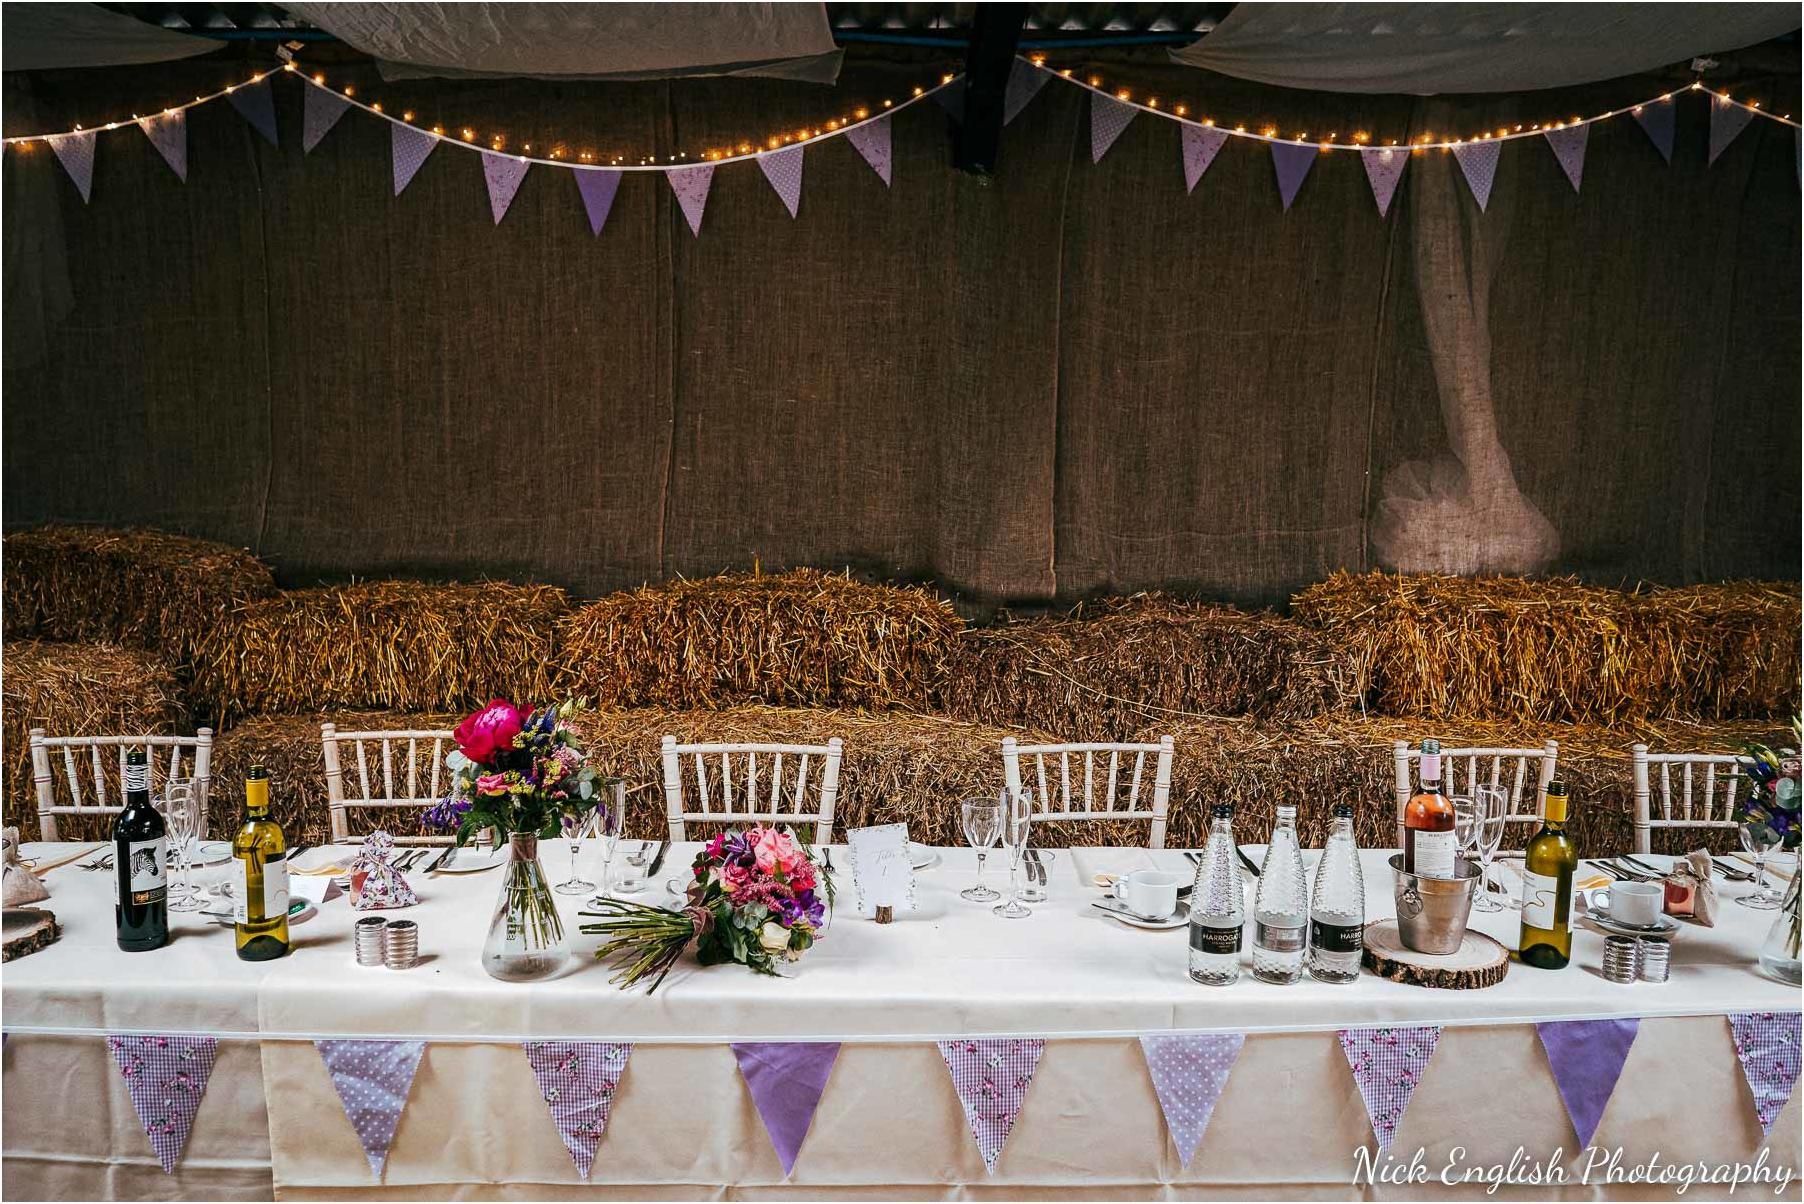 Whitebottom_Farm_Wedding_Manchester_Photograph-61.jpg